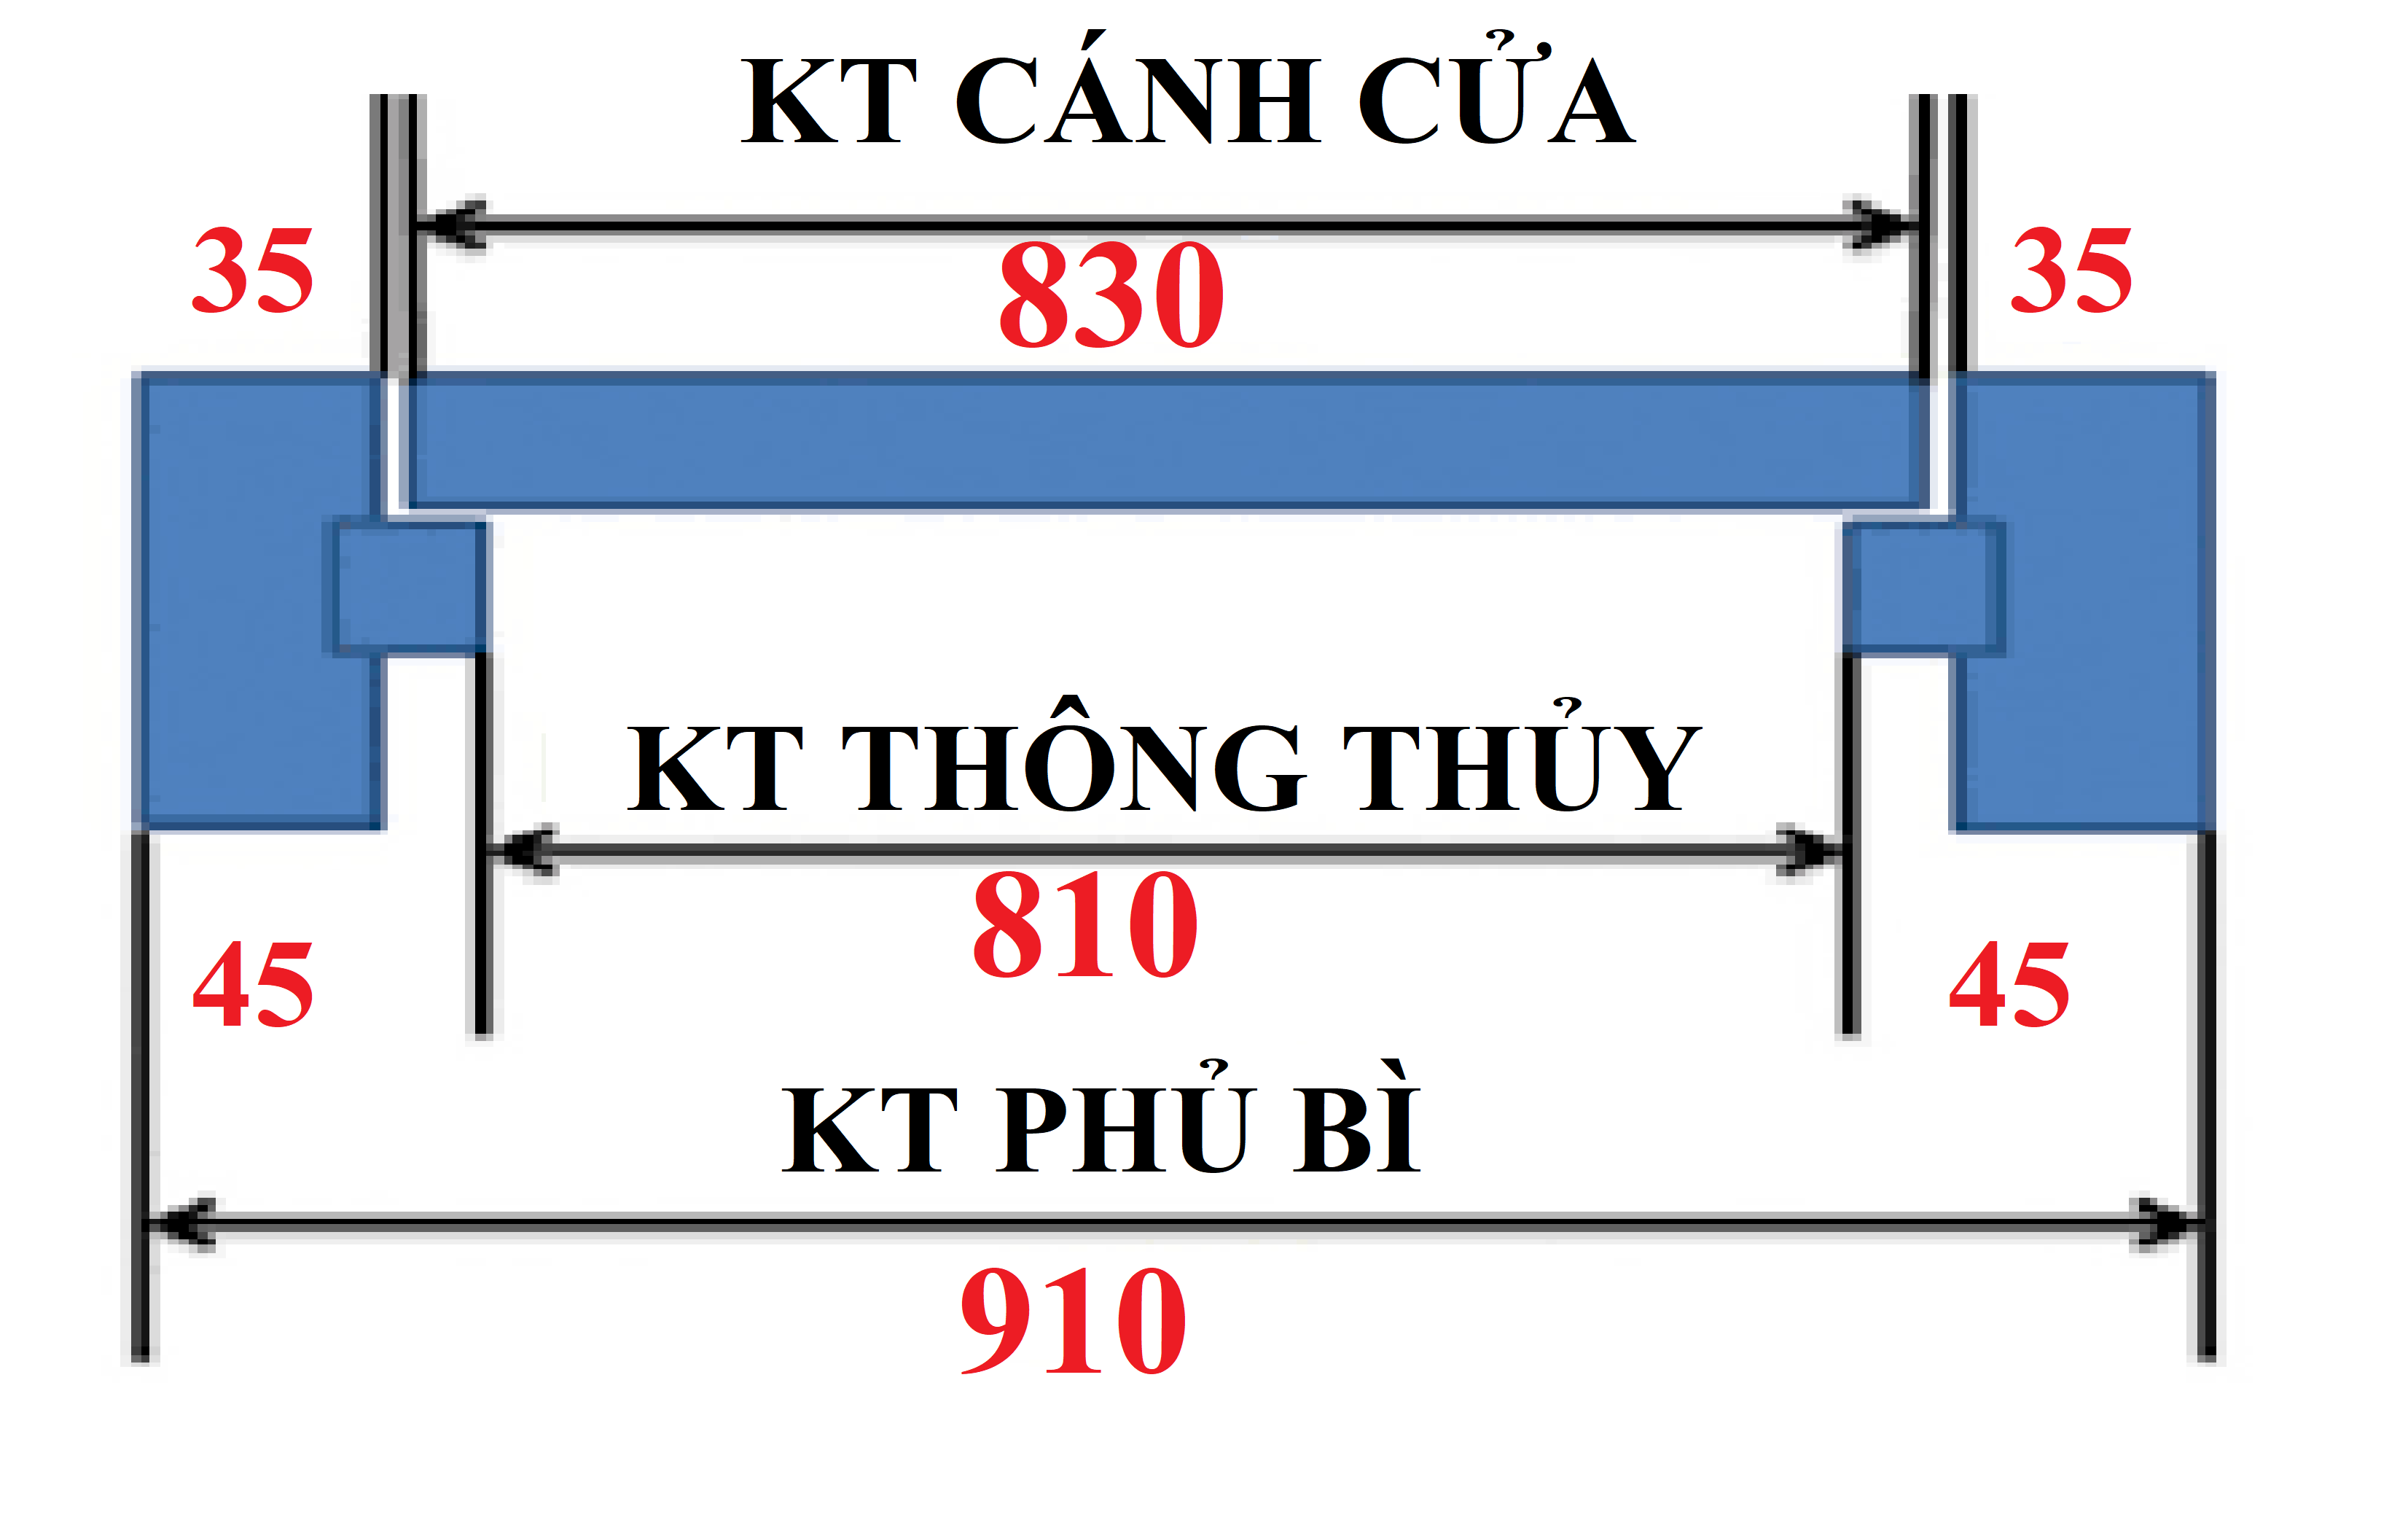 kich-thuoc-thong-thuy-cua-go-nhua-composite